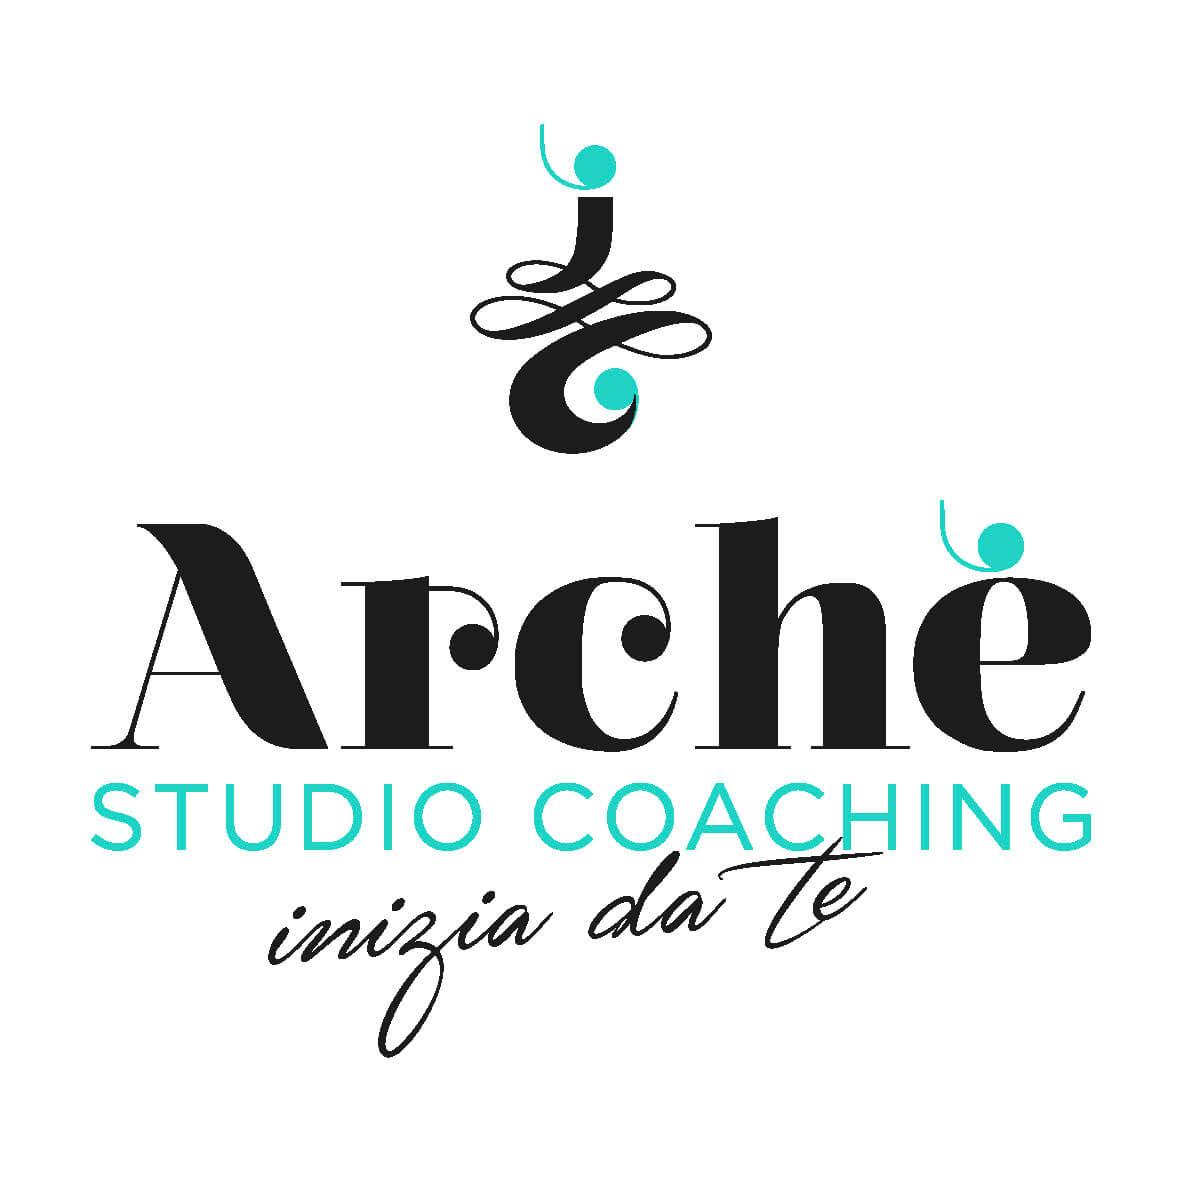 Archè Studio Coaching